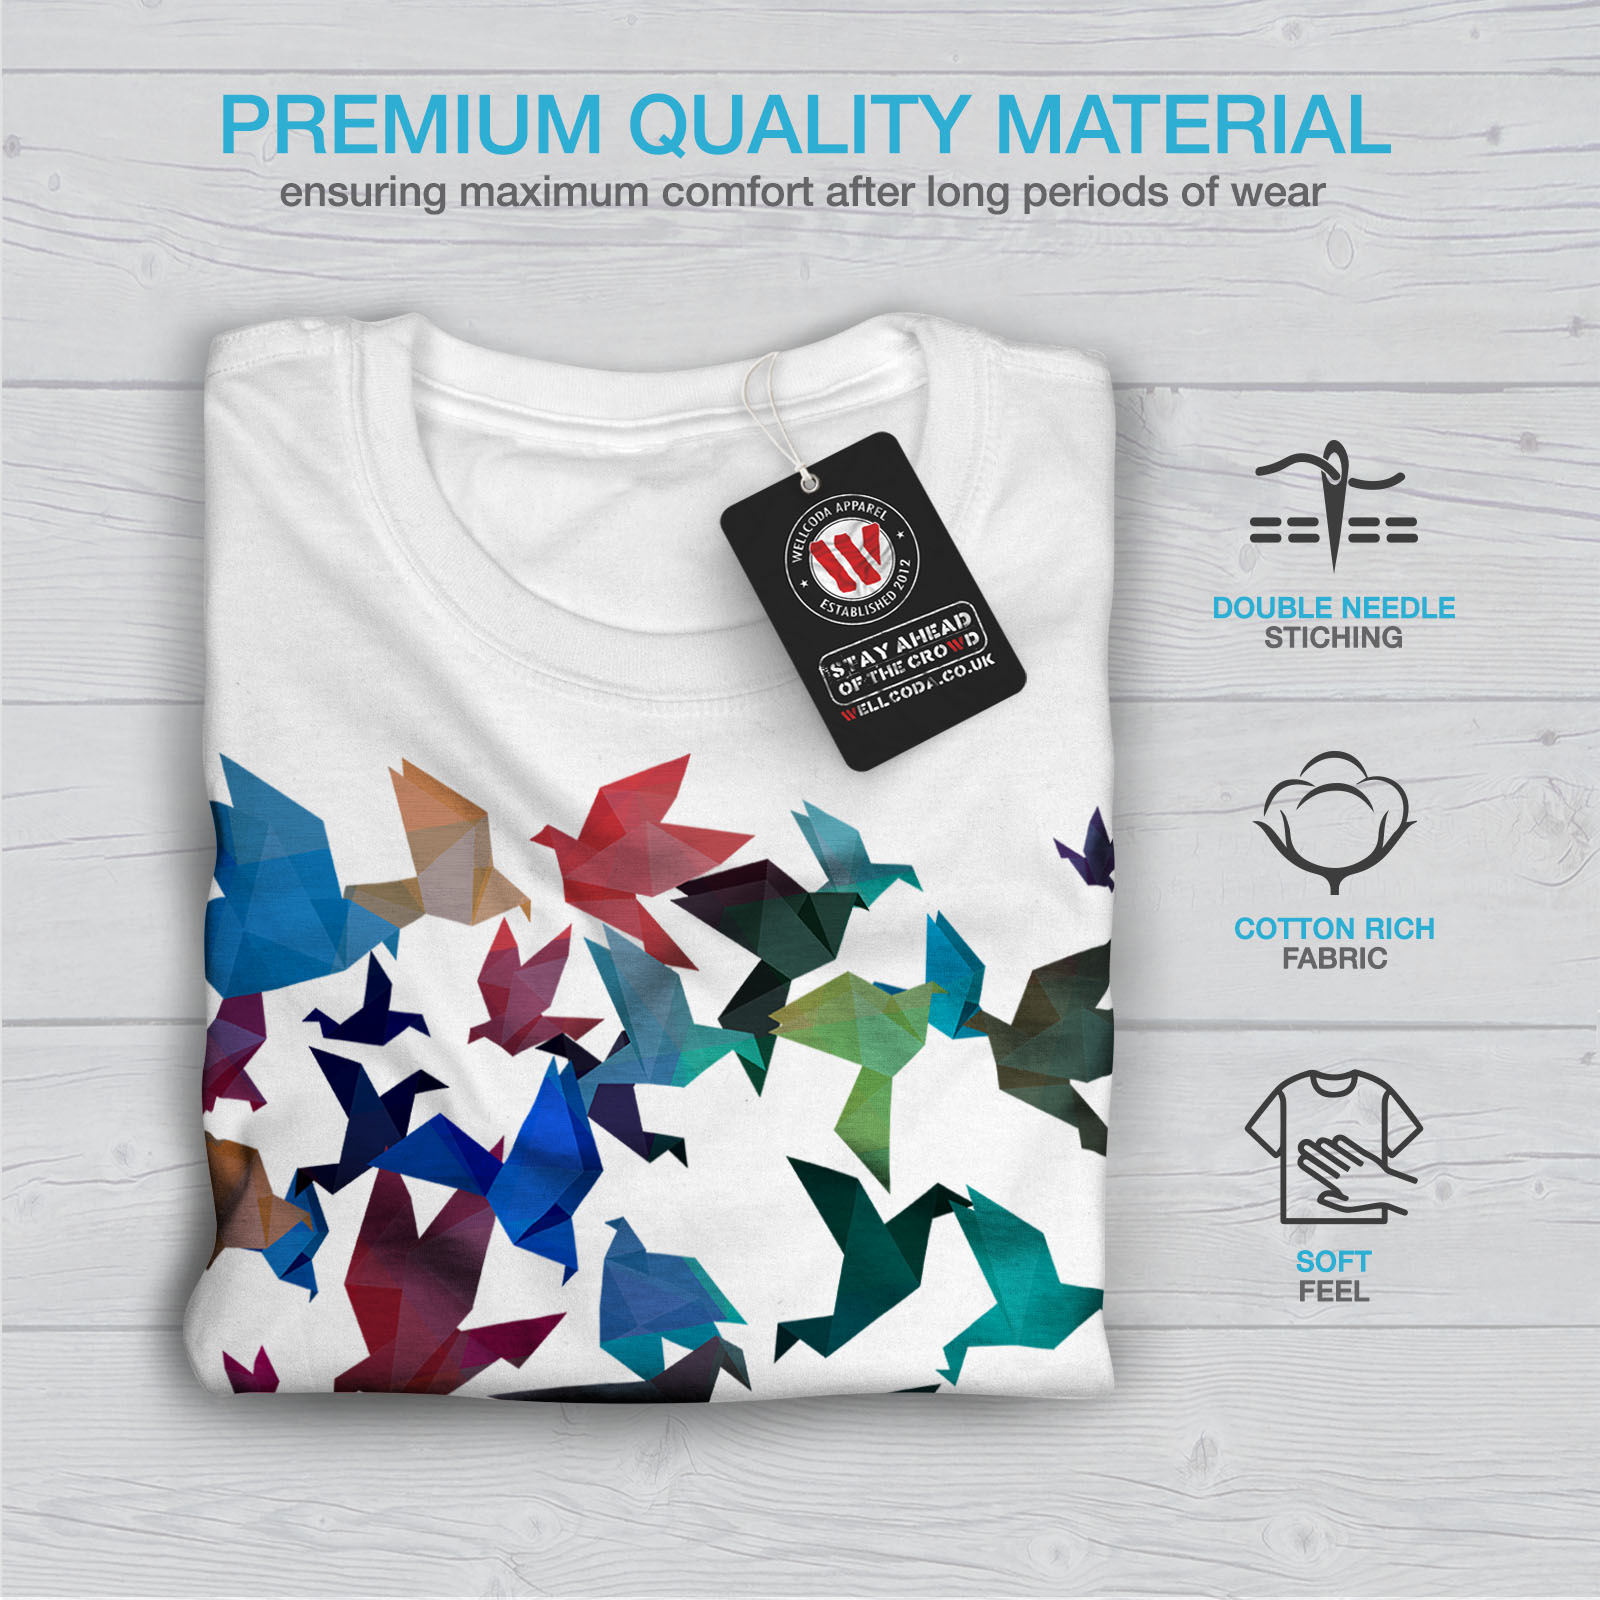 Wellcoda-Origami-Bird-Colors-Mens-T-shirt-Craft-Graphic-Design-Printed-Tee thumbnail 13